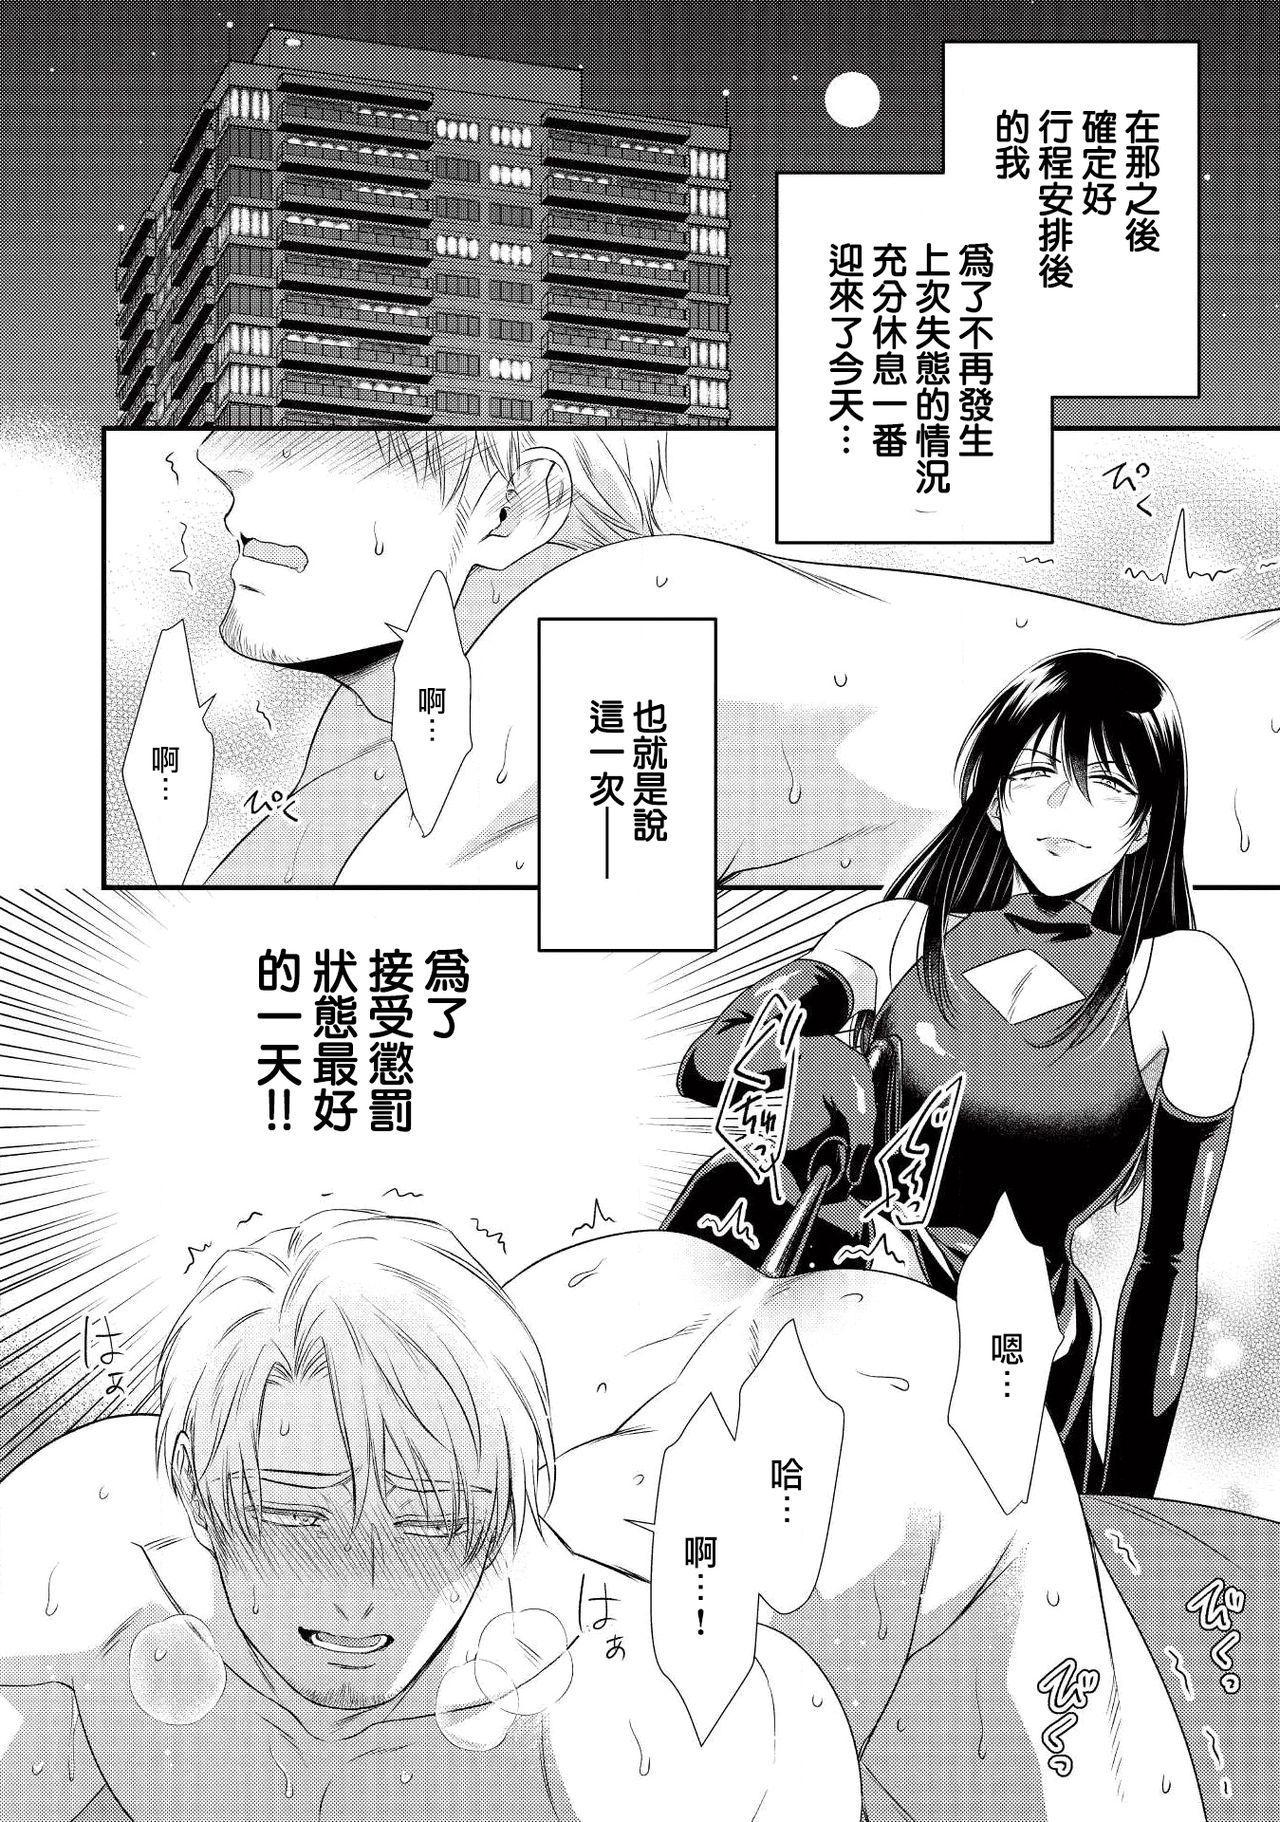 [Aion Kiu] Ijimete Kudasai Omega-sama ch.1-2 [Chinese] [沒有漢化] [Digital] 44